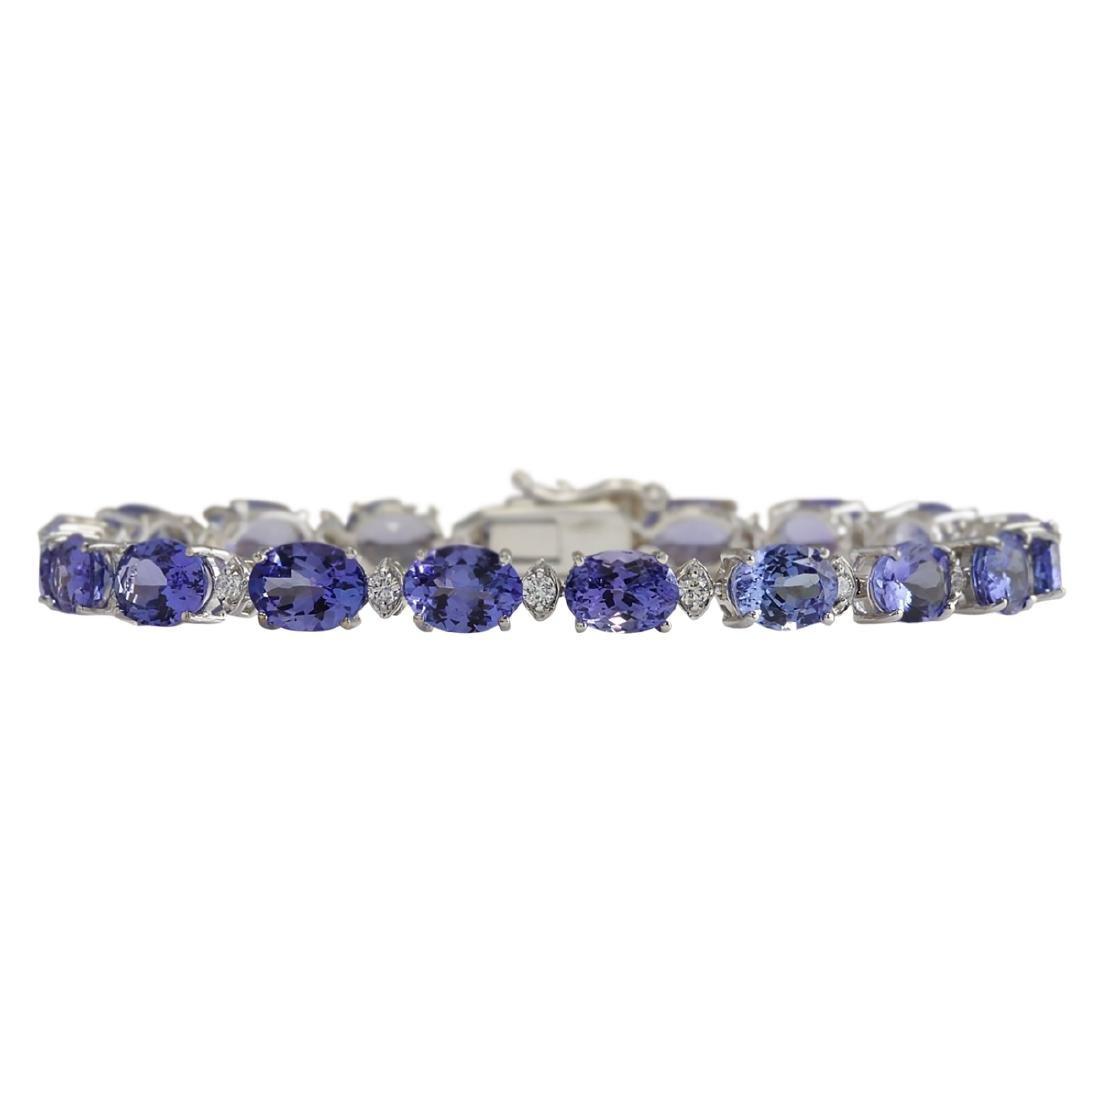 23.35 CTW Natural Tanzanite And Dimond Bracelet In 18K